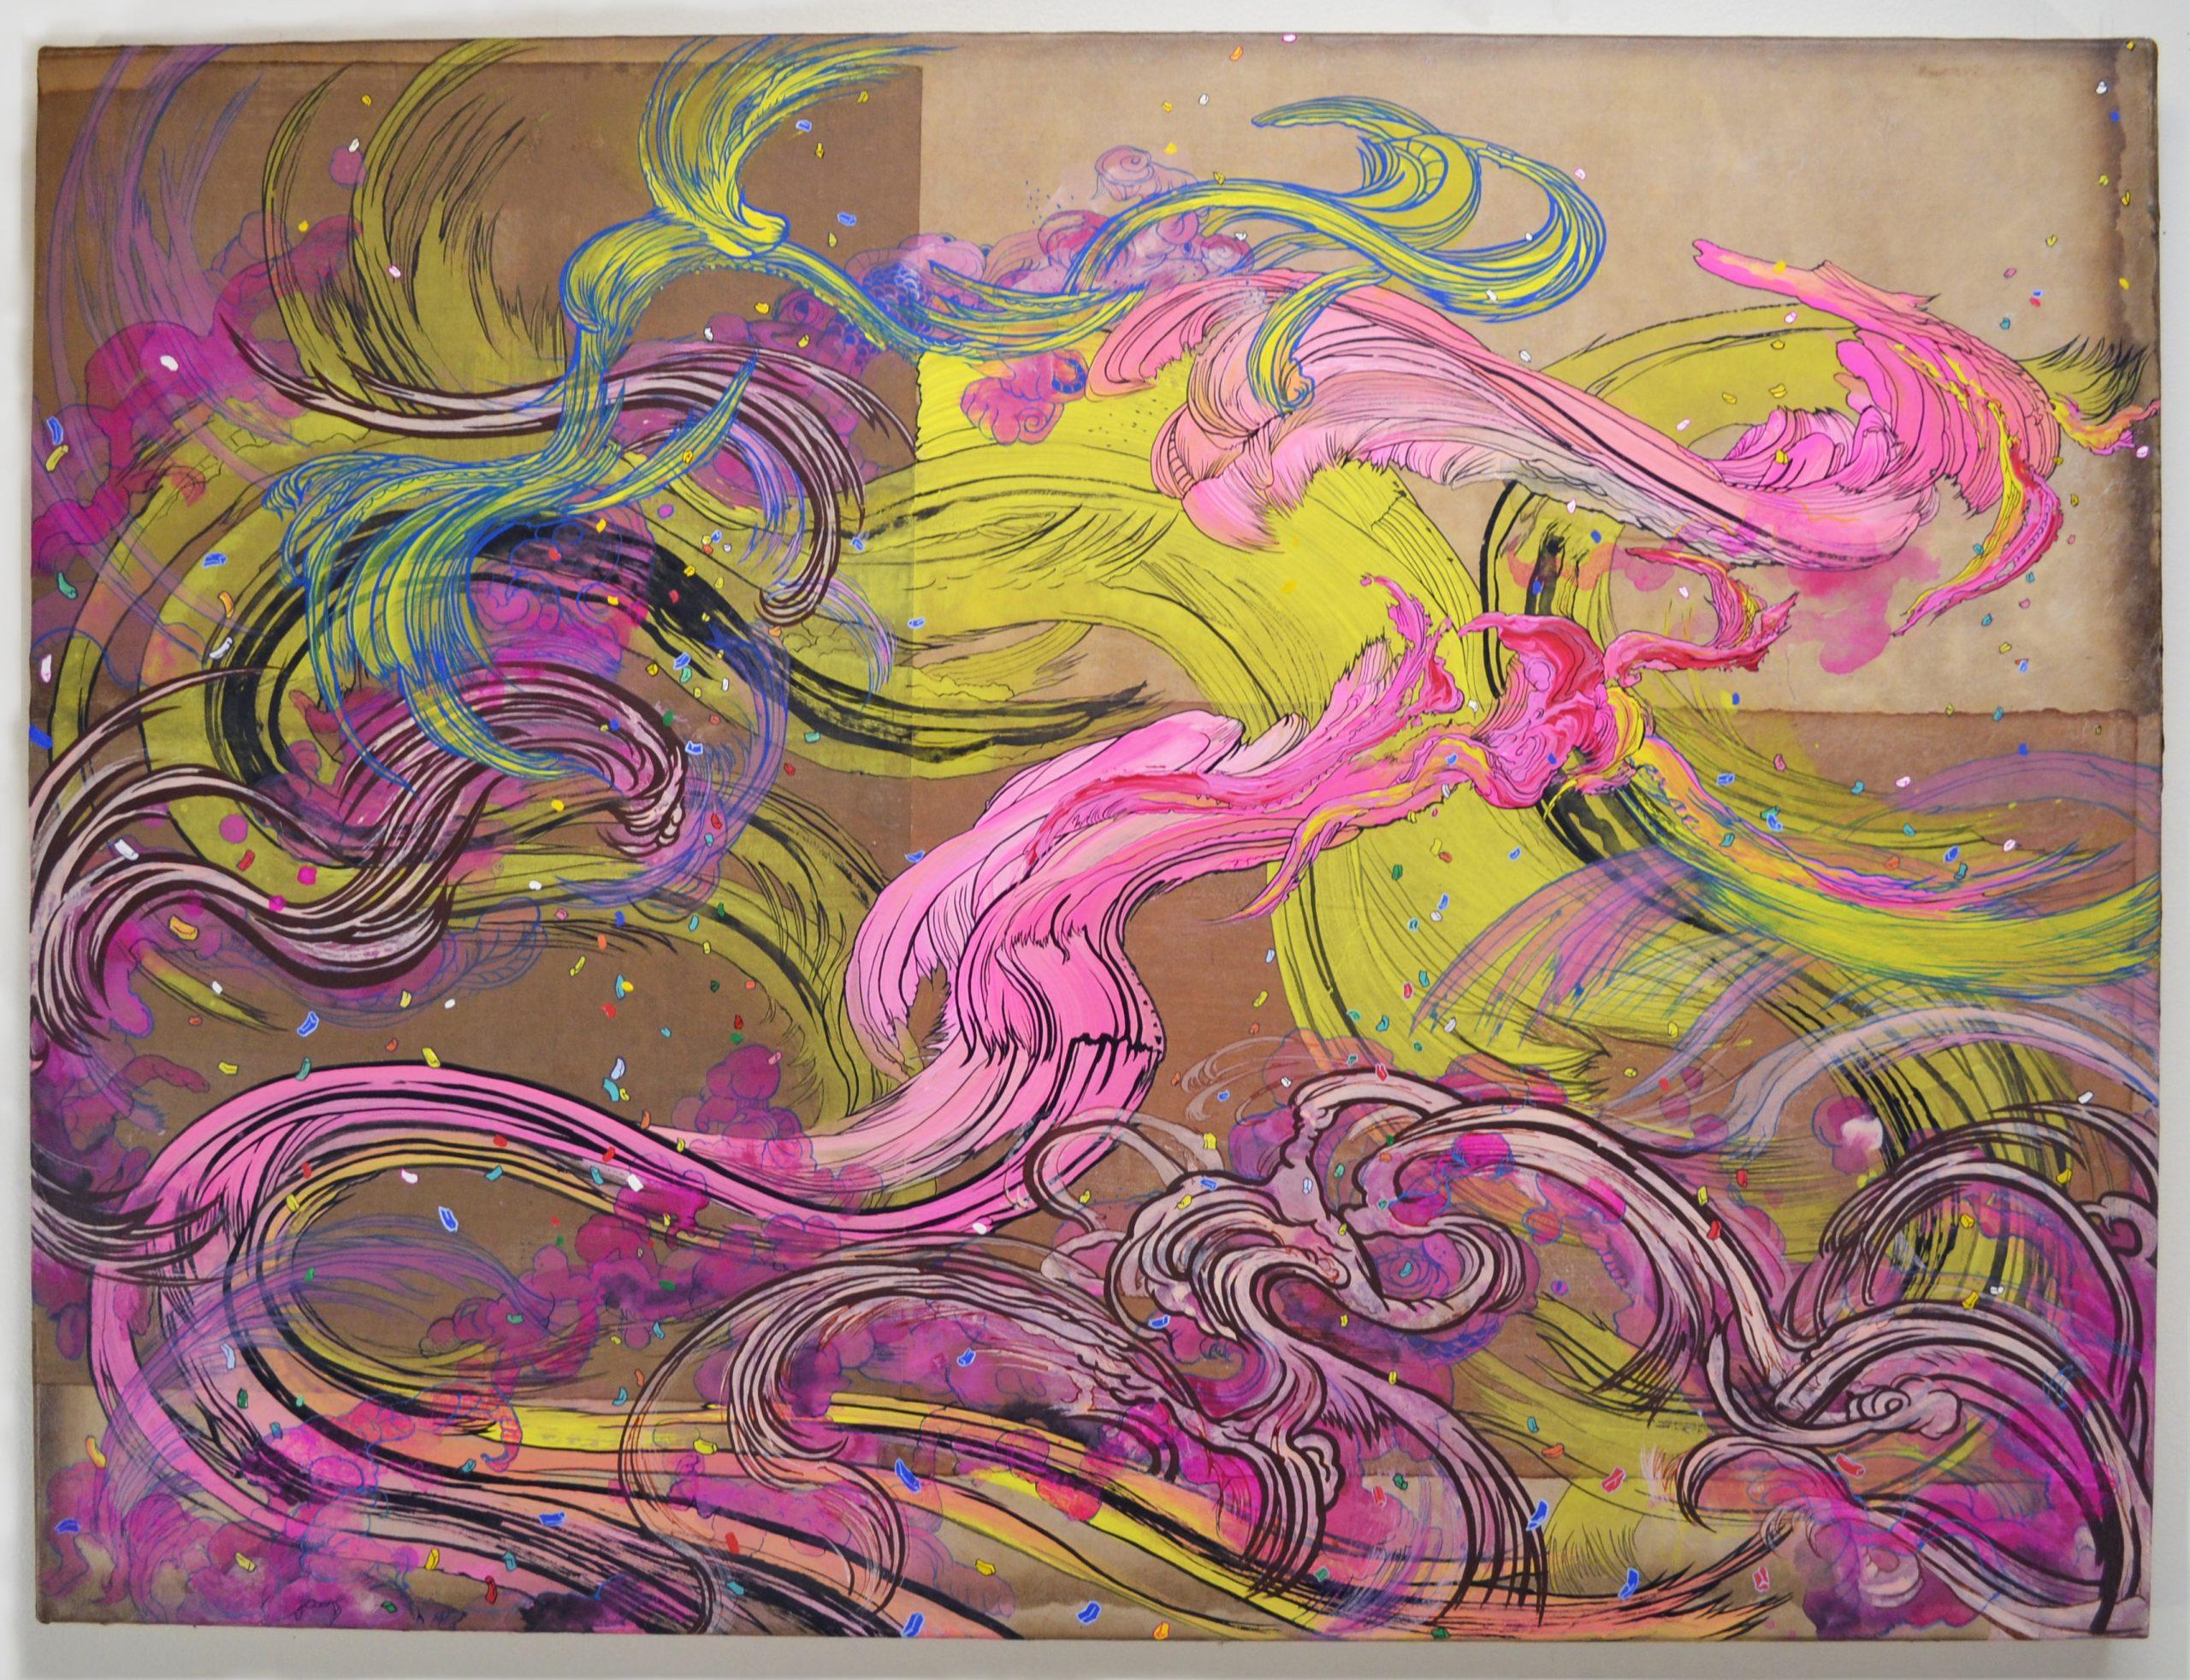 Jiha Moon, Yellowave (with Pink), 2020, Ink, acrylic on Hanji mounted on canvas, 30 × 40 in